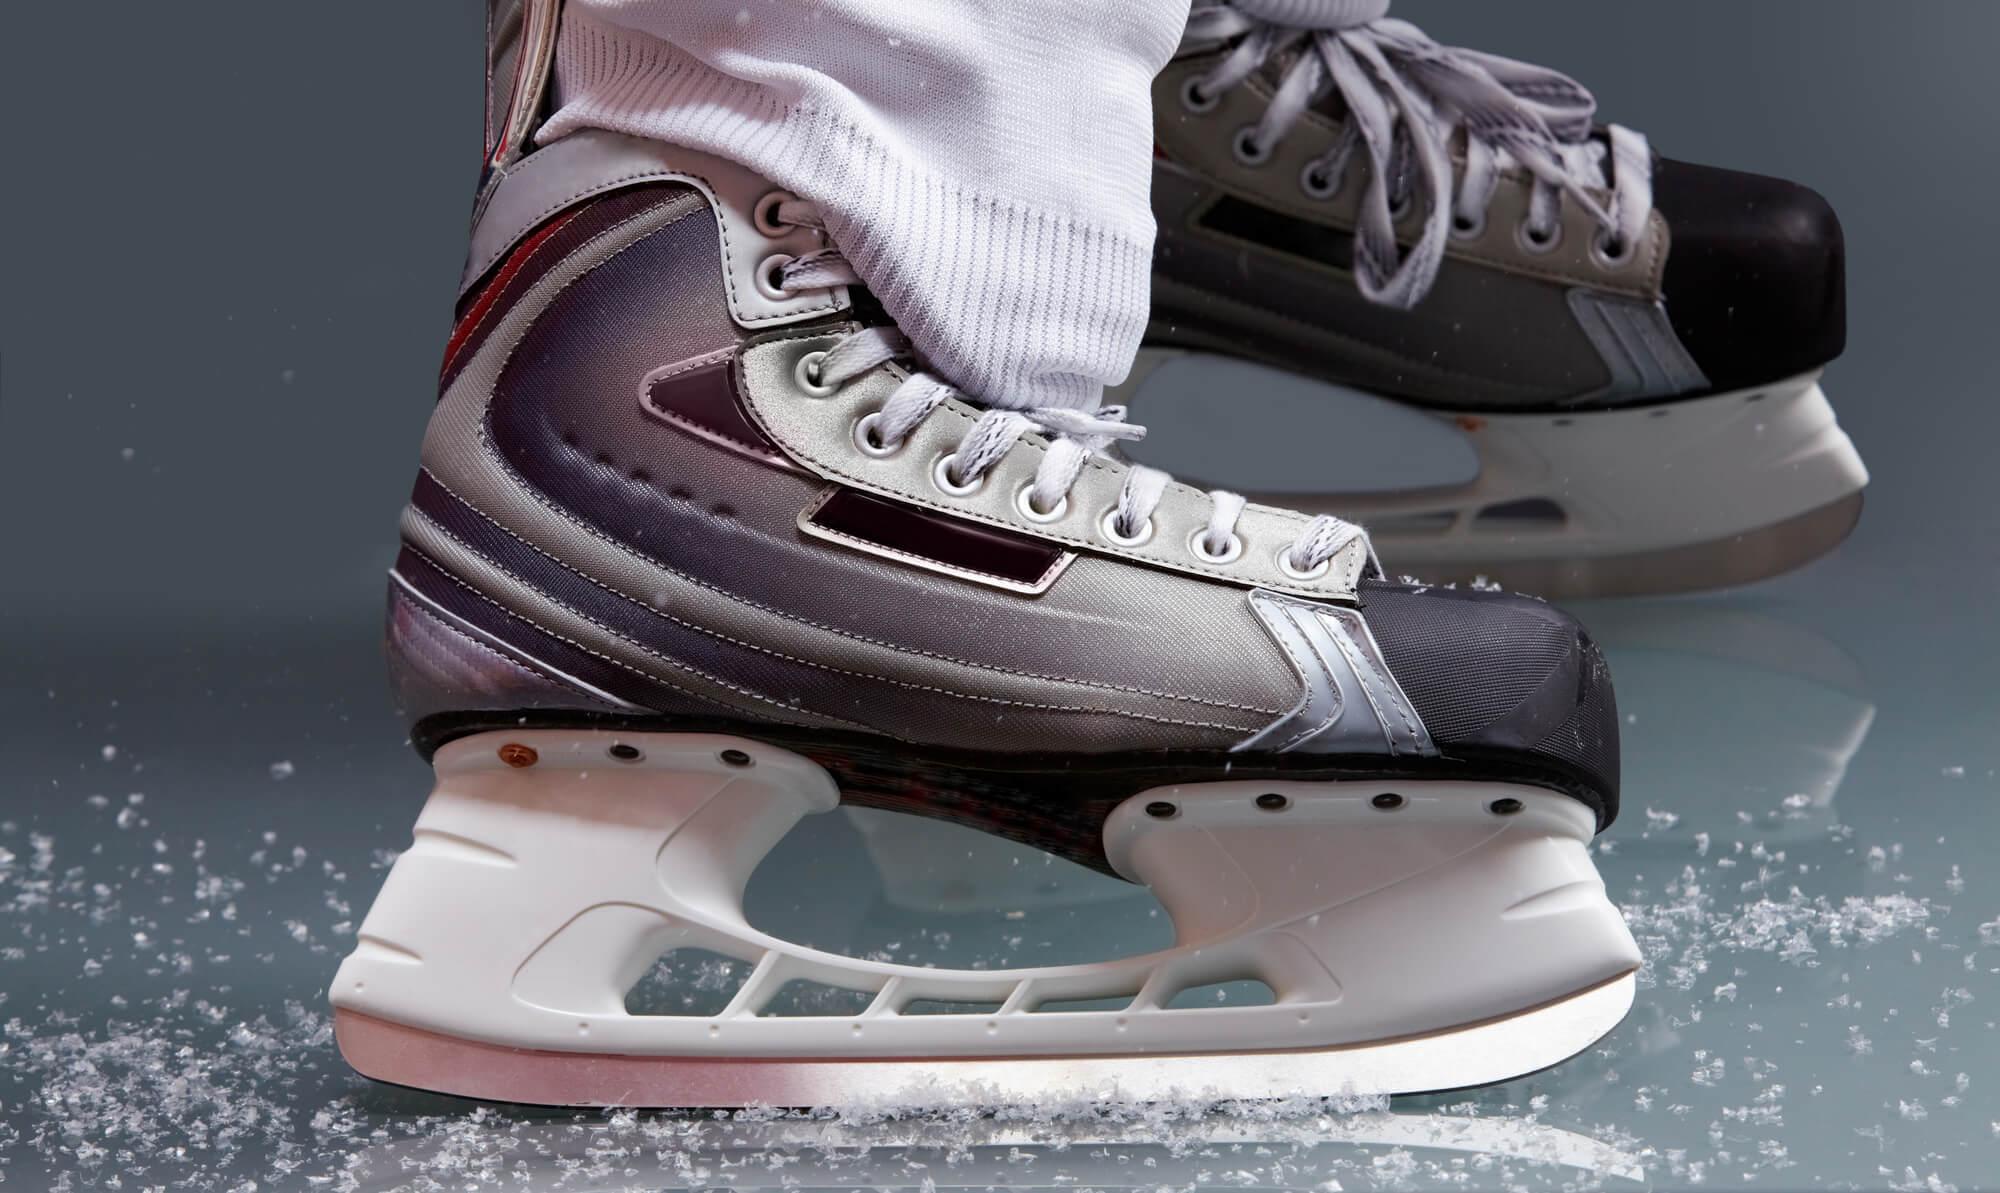 Why are hockey skates so expensive